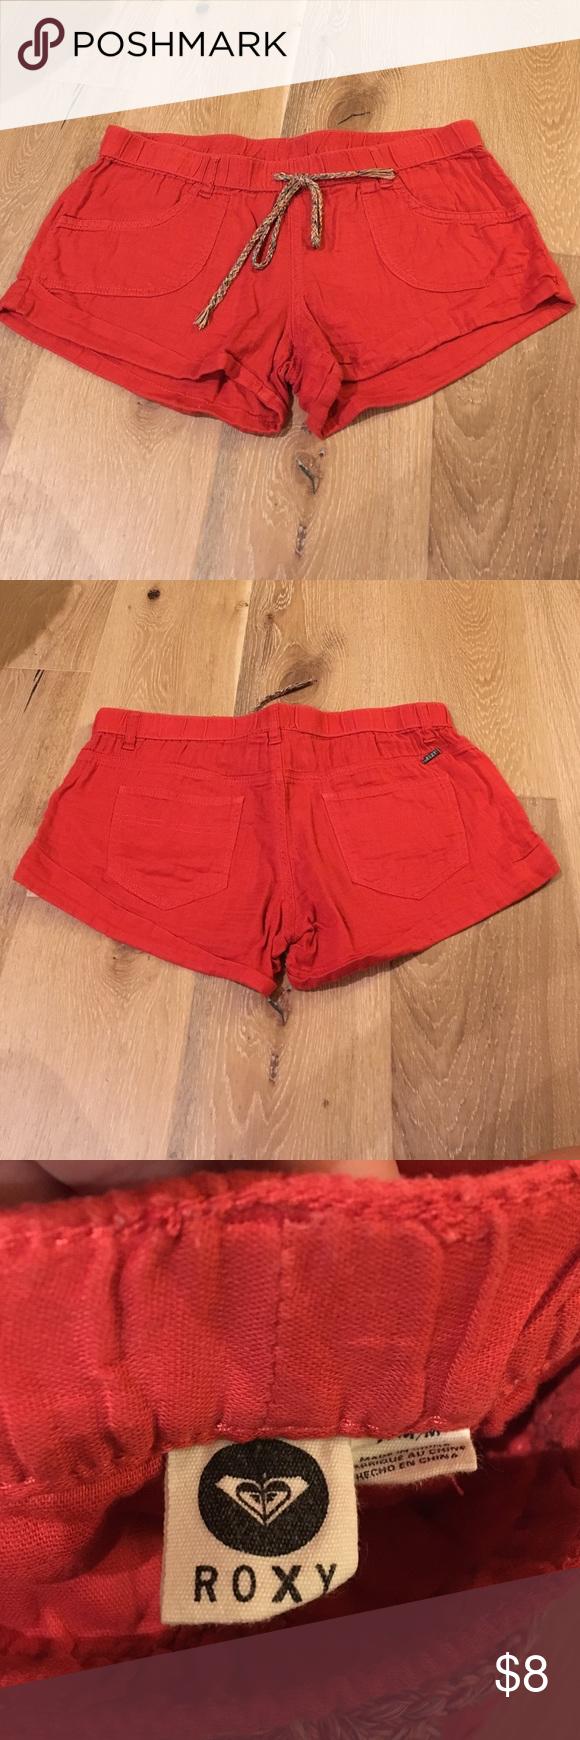 Roxy burnt orange linen shorts Roxy burnt orange linen shorts. Rainbow tie at waist band. Worn but still great condition. Inseam is 2 inches. Roxy Shorts